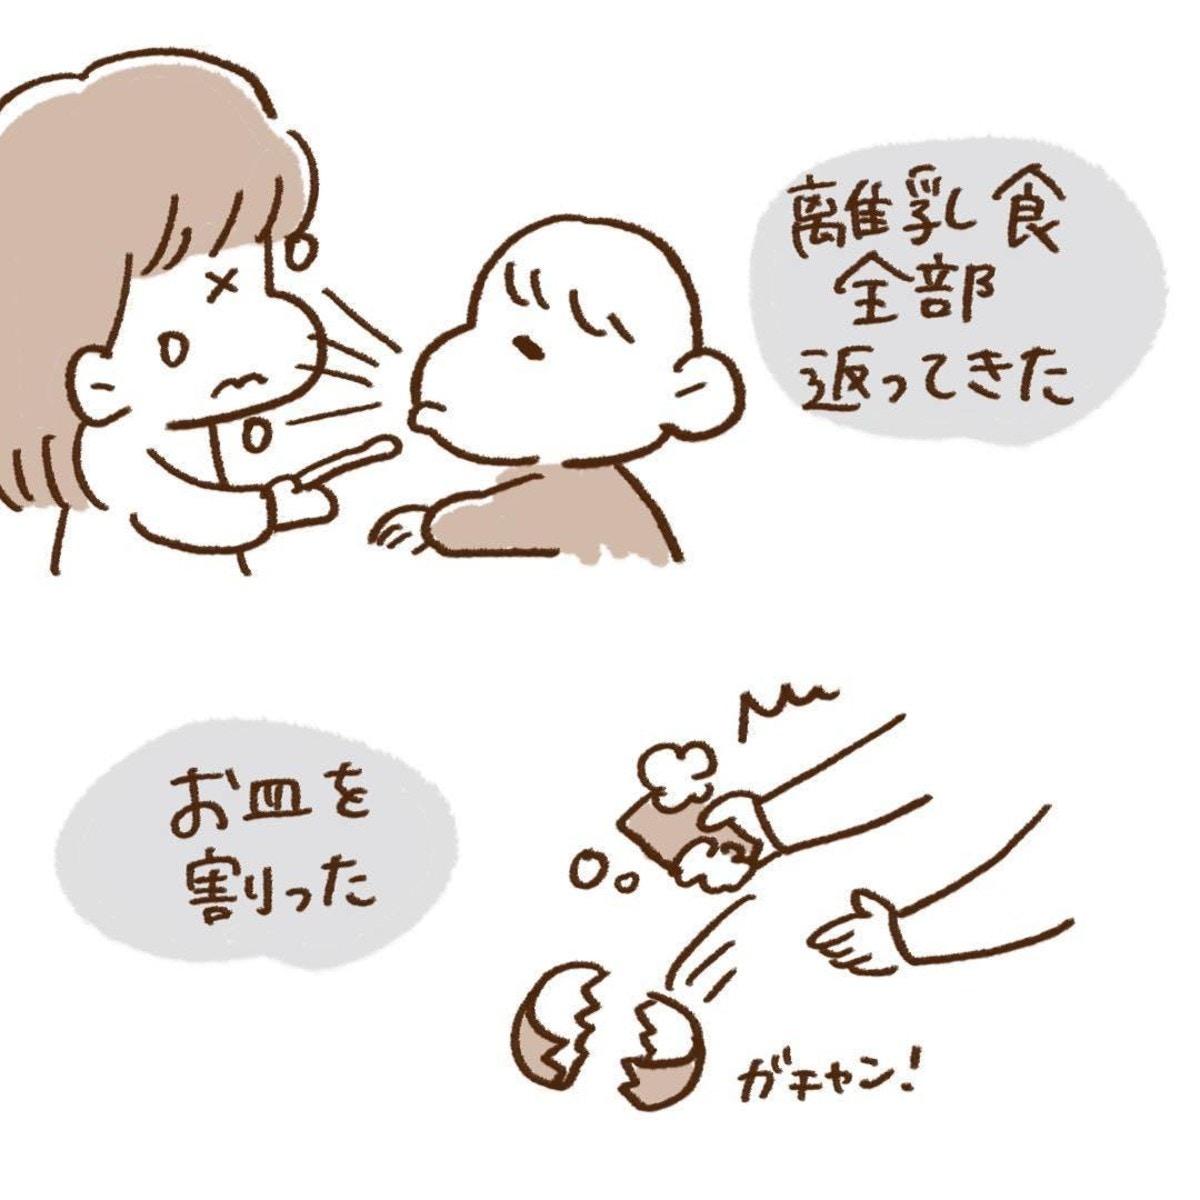 6eb376c5d8a メッシュの抱っこひもは通年使える?先輩ママの意見も (ママリ-mamari-)